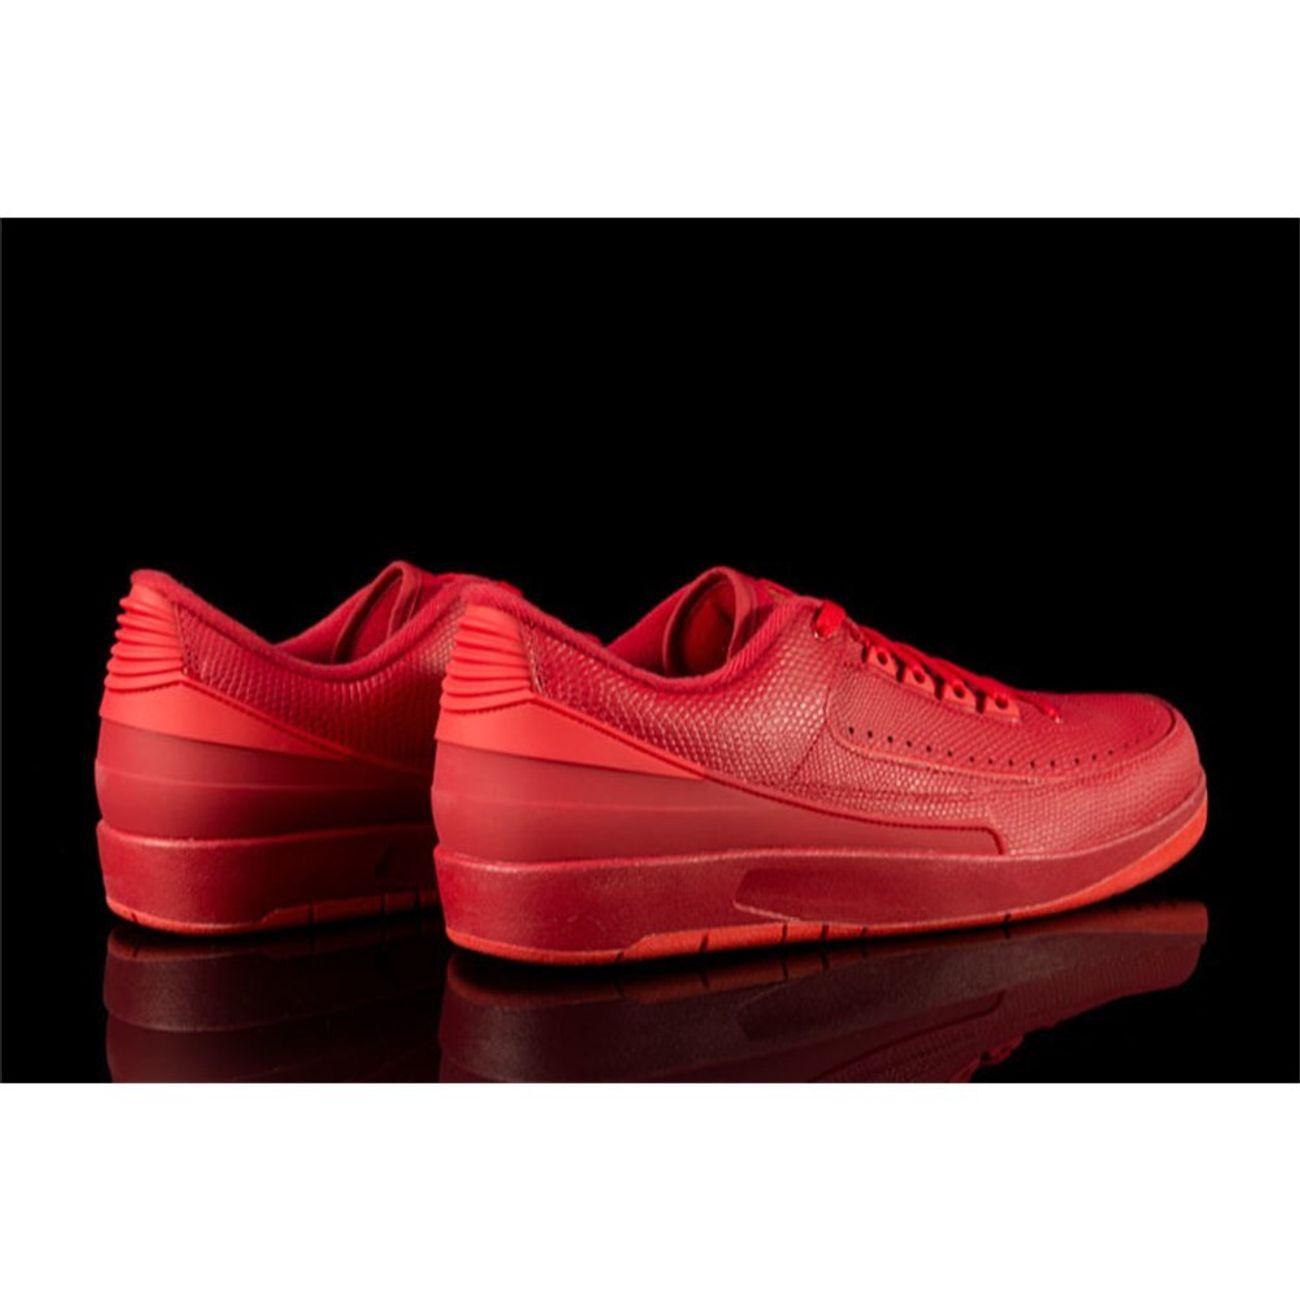 Jordan Ii Homme Retro Low ModeLifestyle Nike shBodCxtrQ